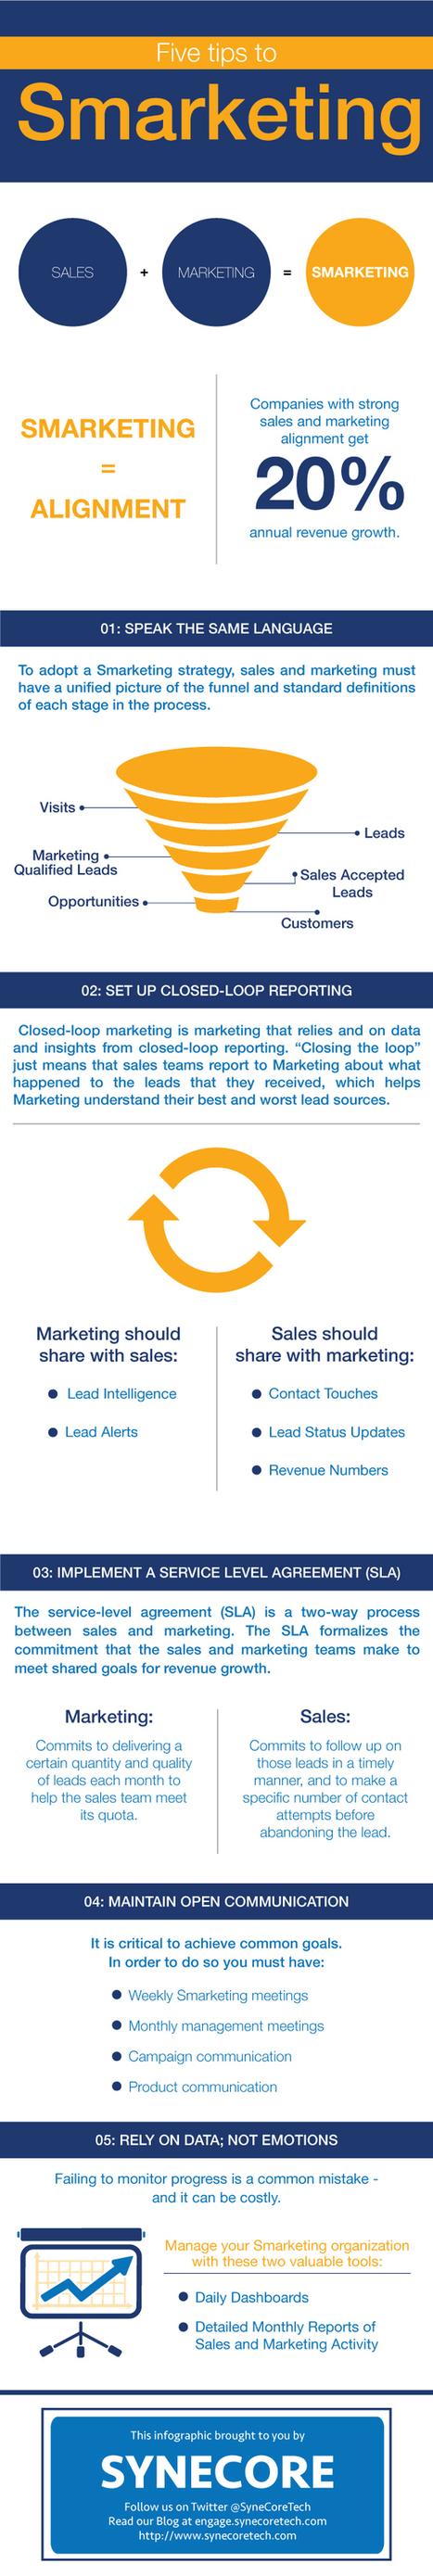 5 Tips to Smarketing! [Infographic] | SaaS Sales | Scoop.it